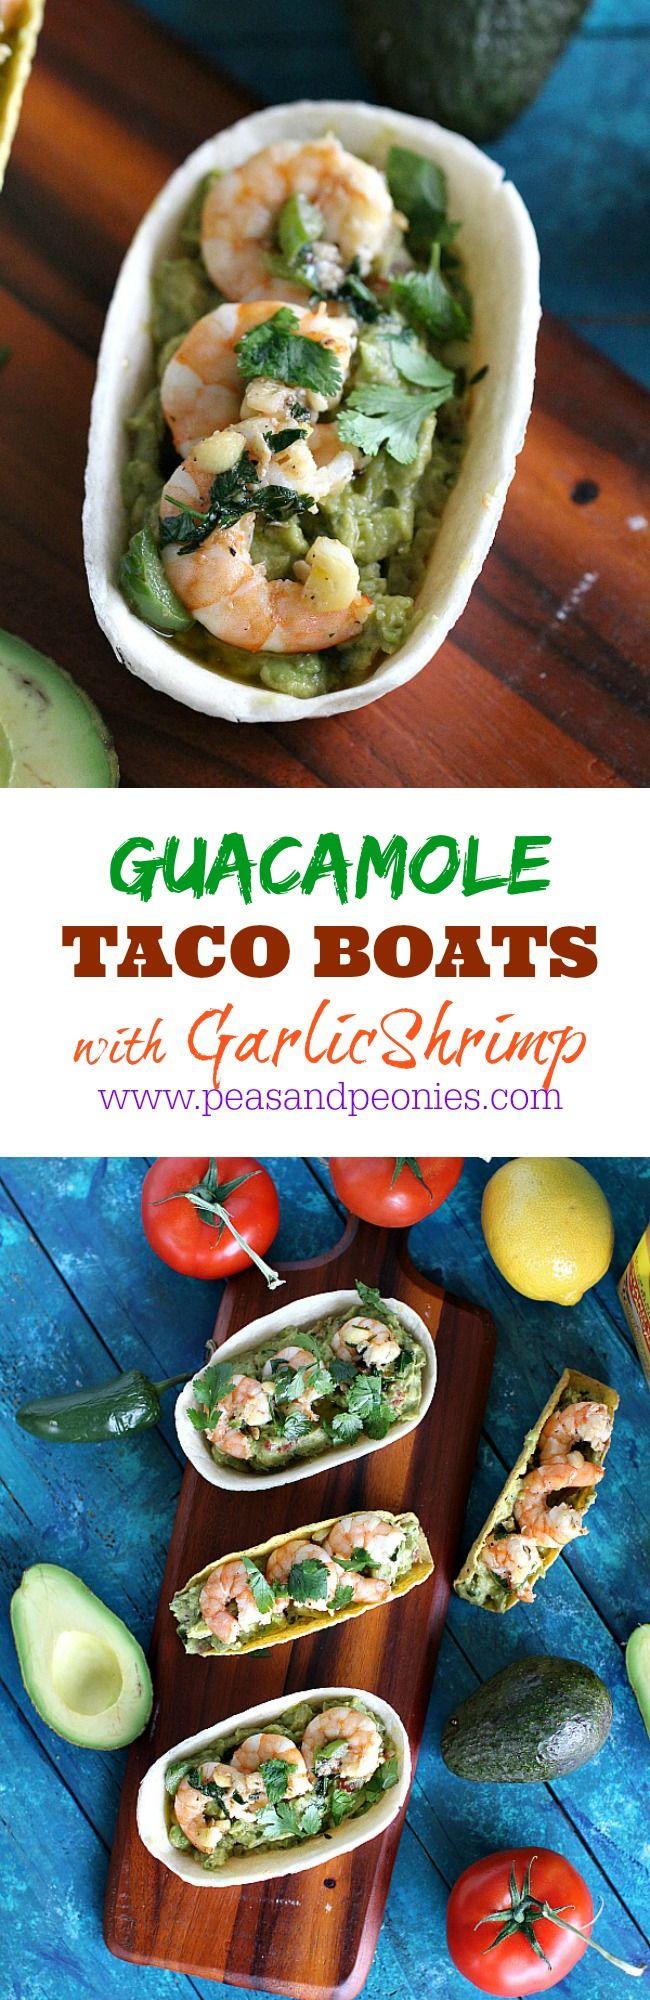 Guacamole Taco Boats with Shrimp - Peas and Peonies oldelpaso ad